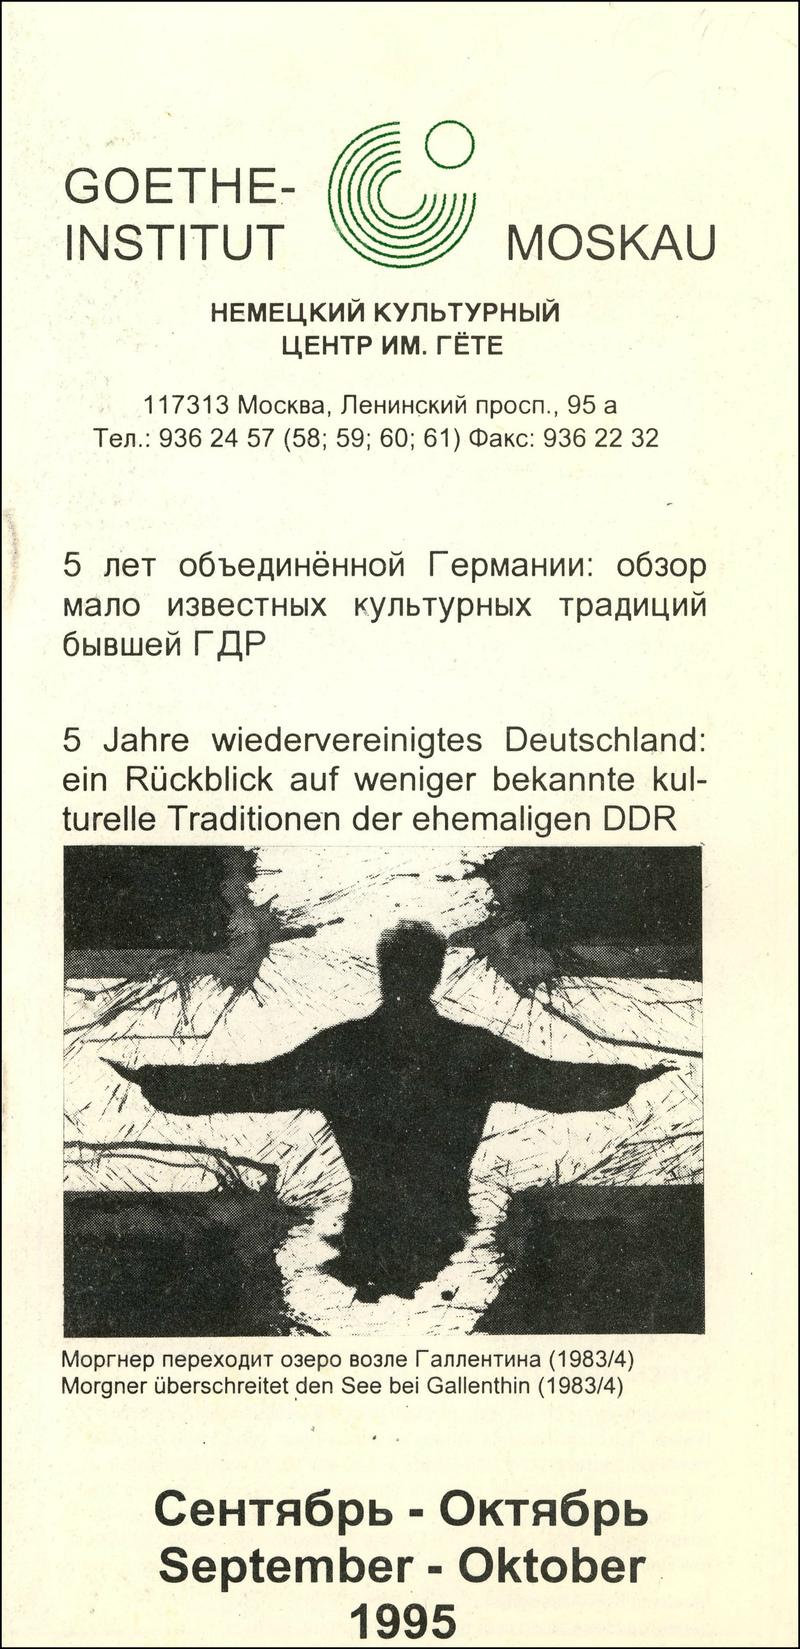 Программа. Немецкий культурный центр им. Гёте